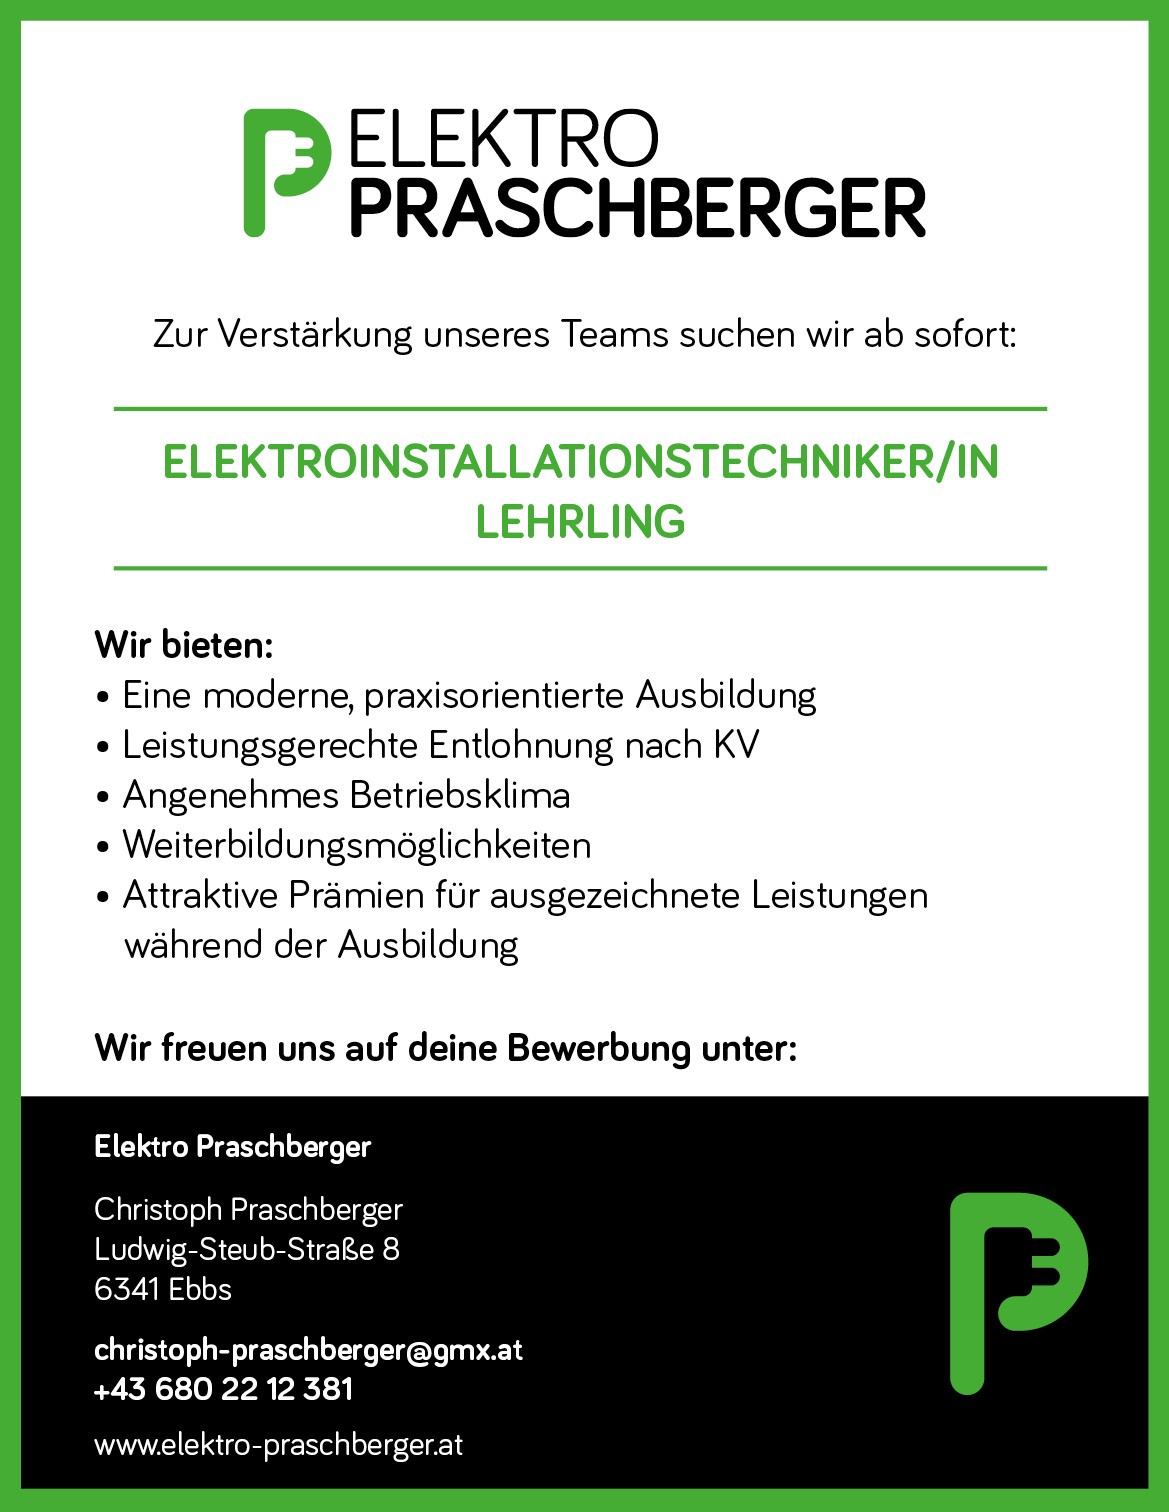 Großzügig Stellenangebote Für Elektriker Lehrling Fotos - Bilder ...